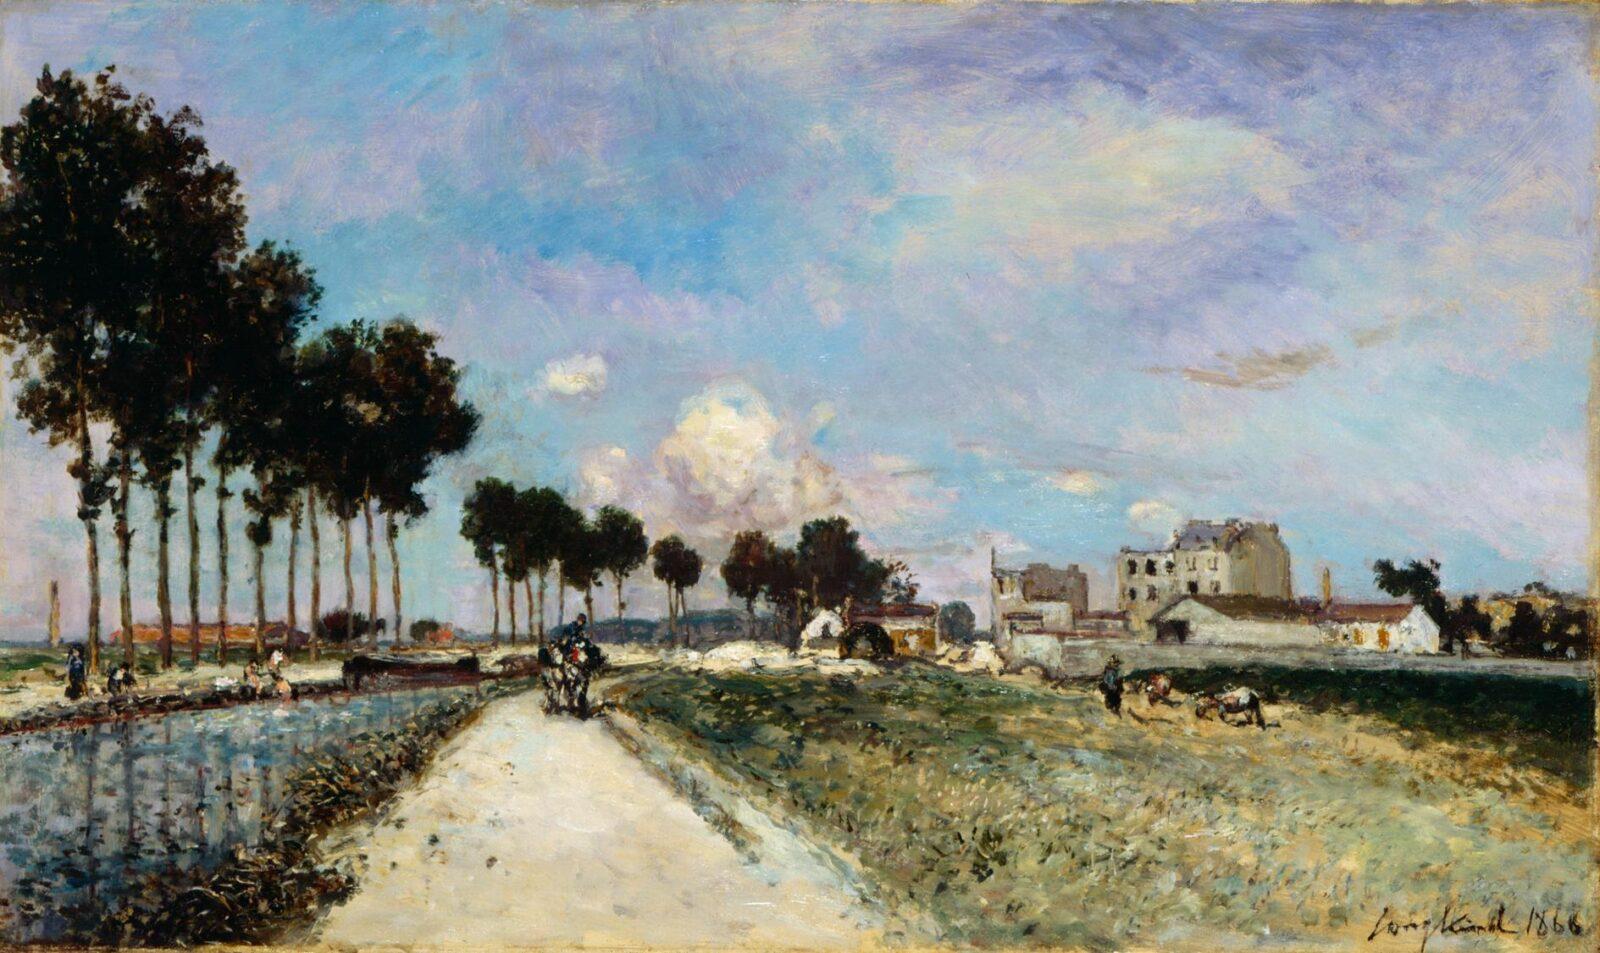 Impressive Exhibition at the Dordrechts Museum Includes Work by Jongkind